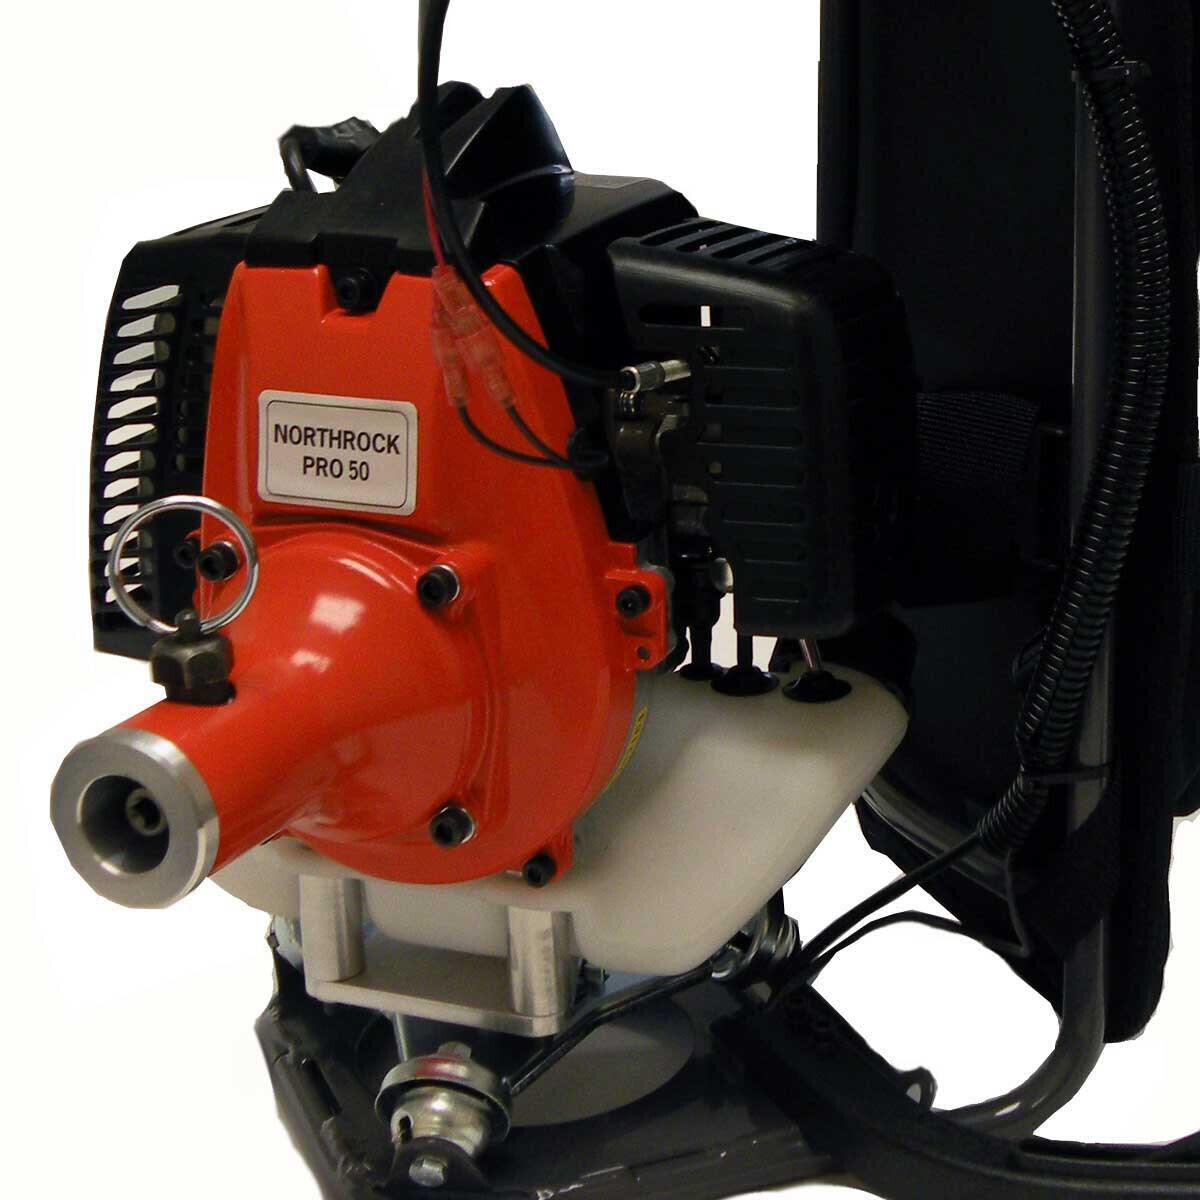 back vibrator pack 50 pro Northrock